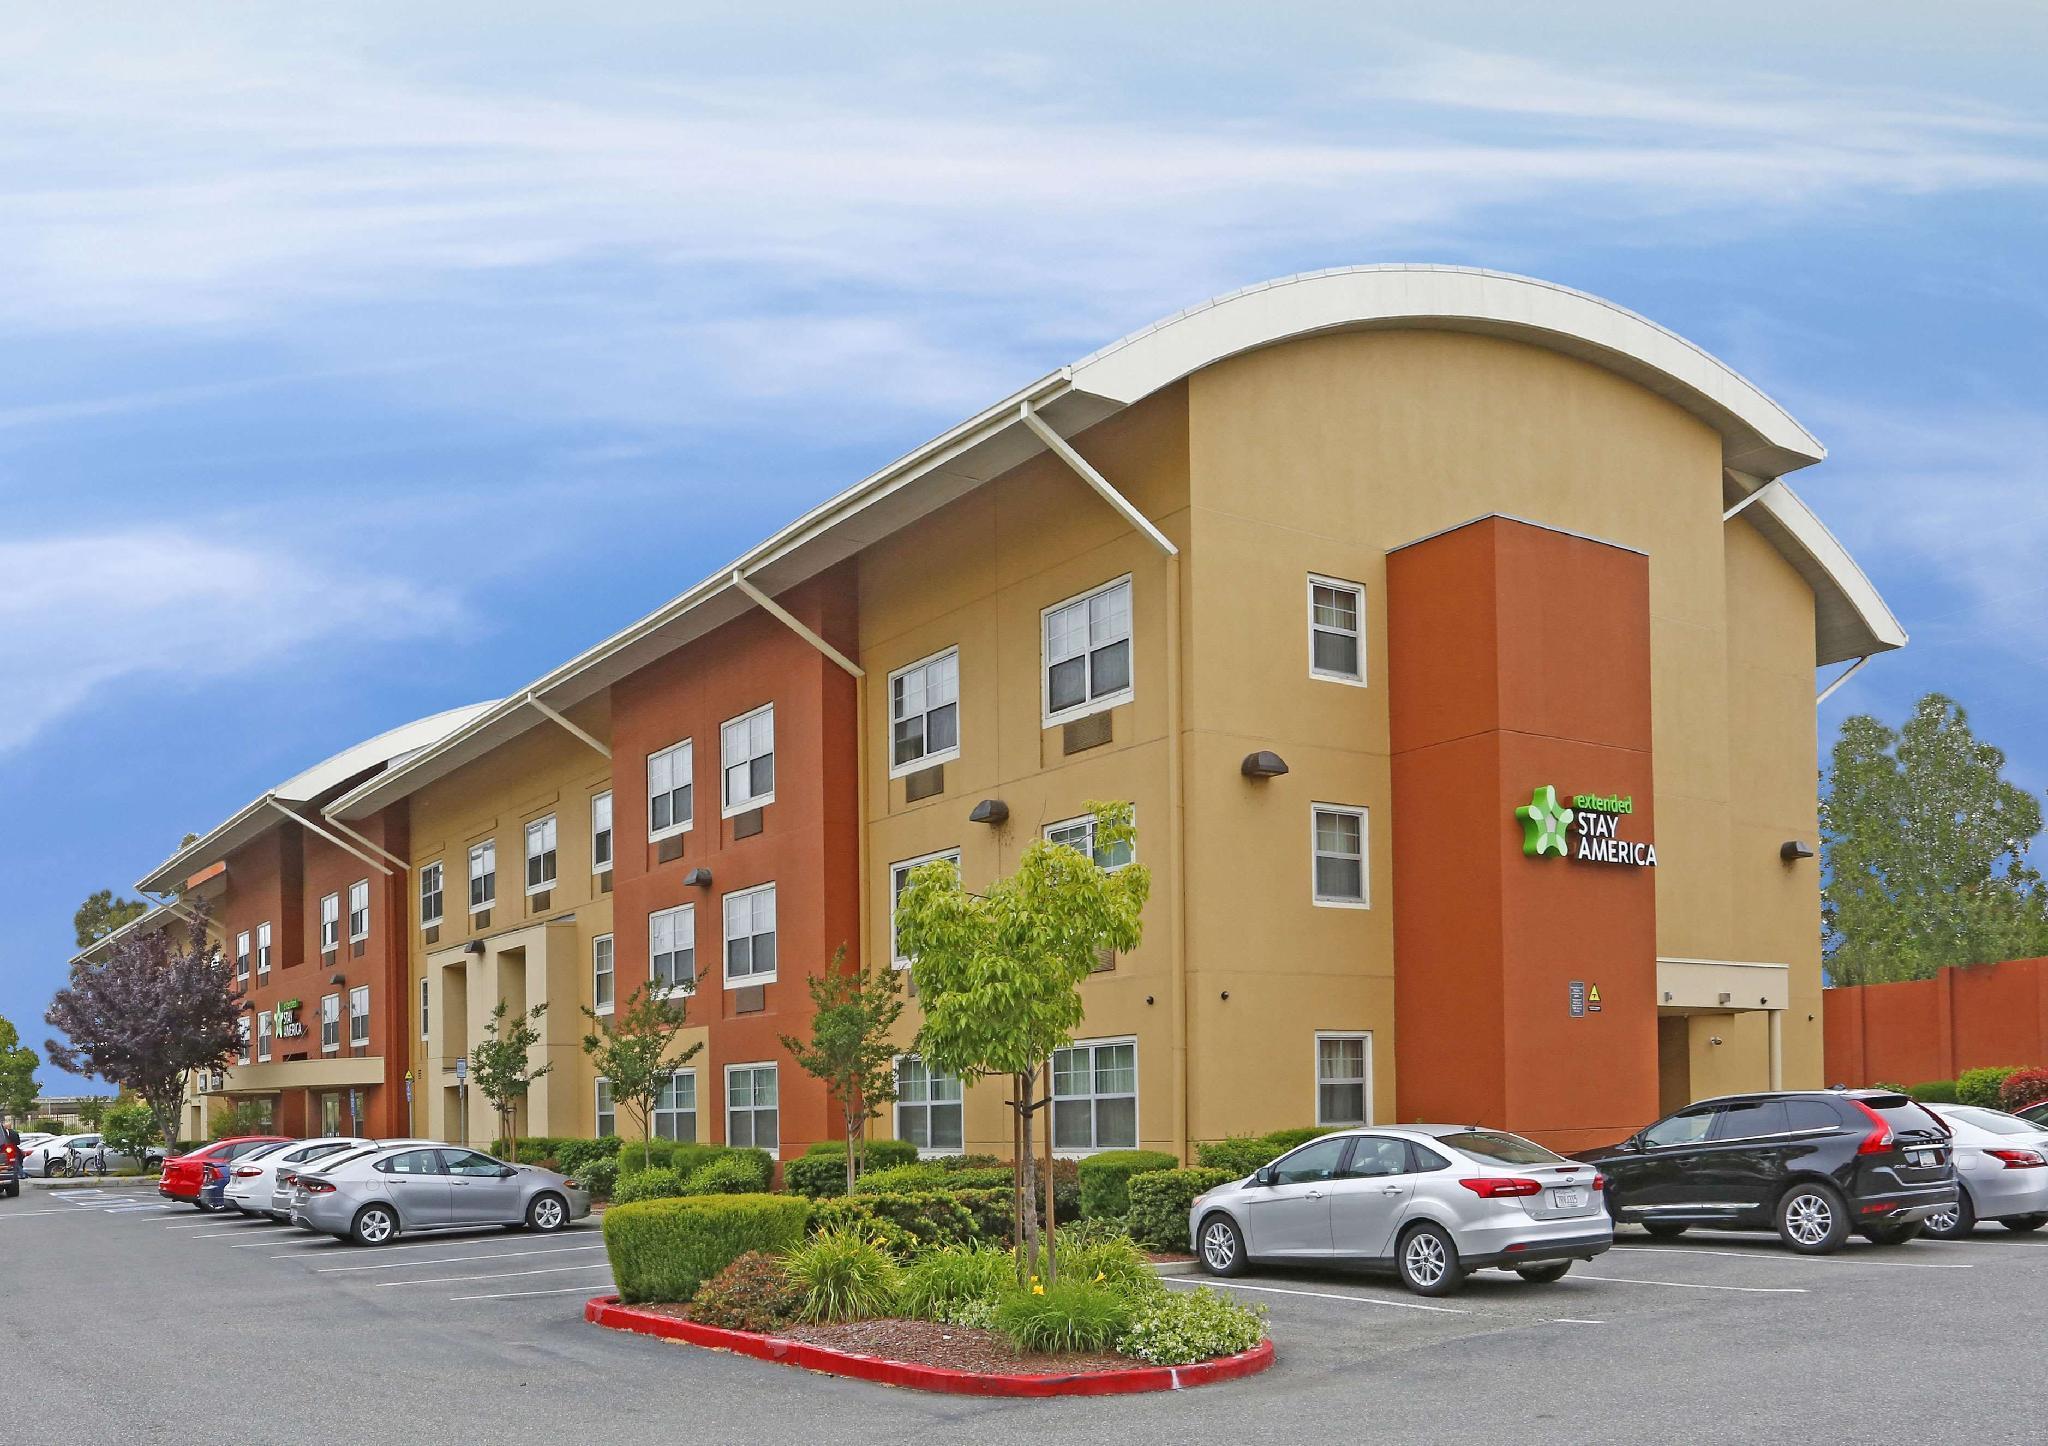 Extended Stay America San Jose Santa Clara